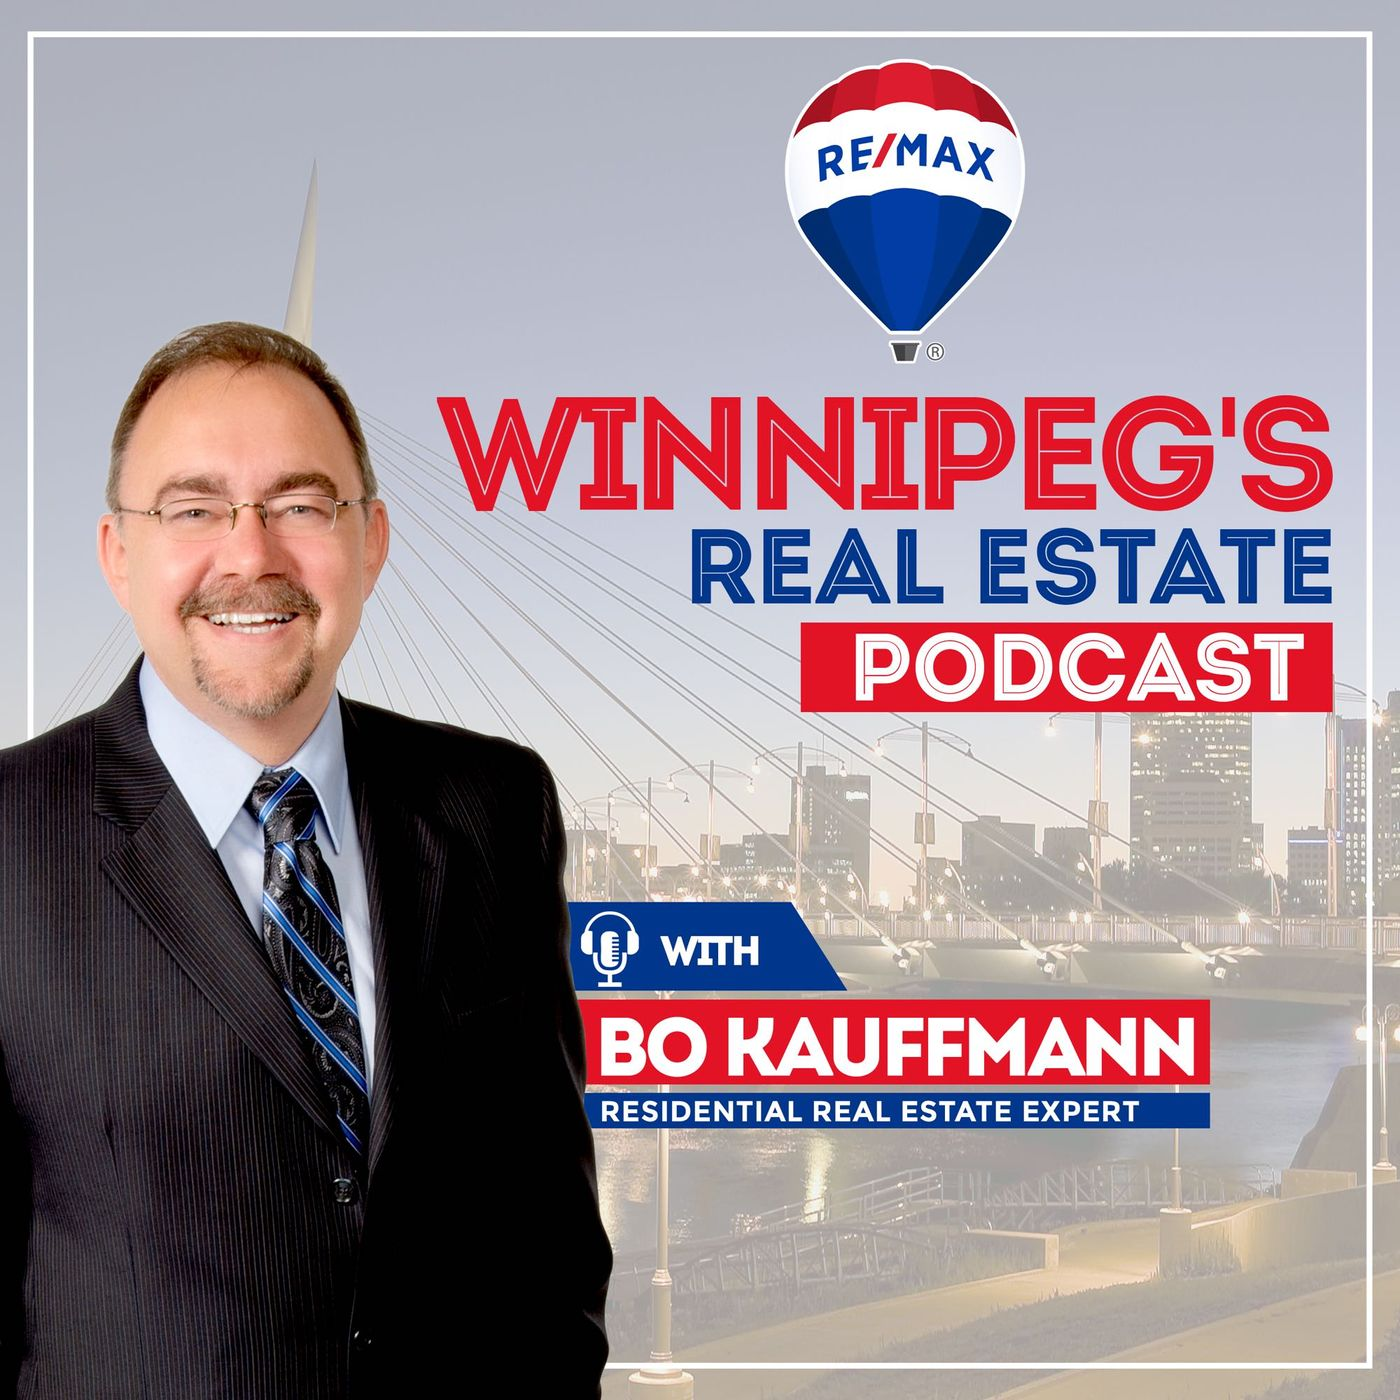 Winnipeg's Real Estate Podcast